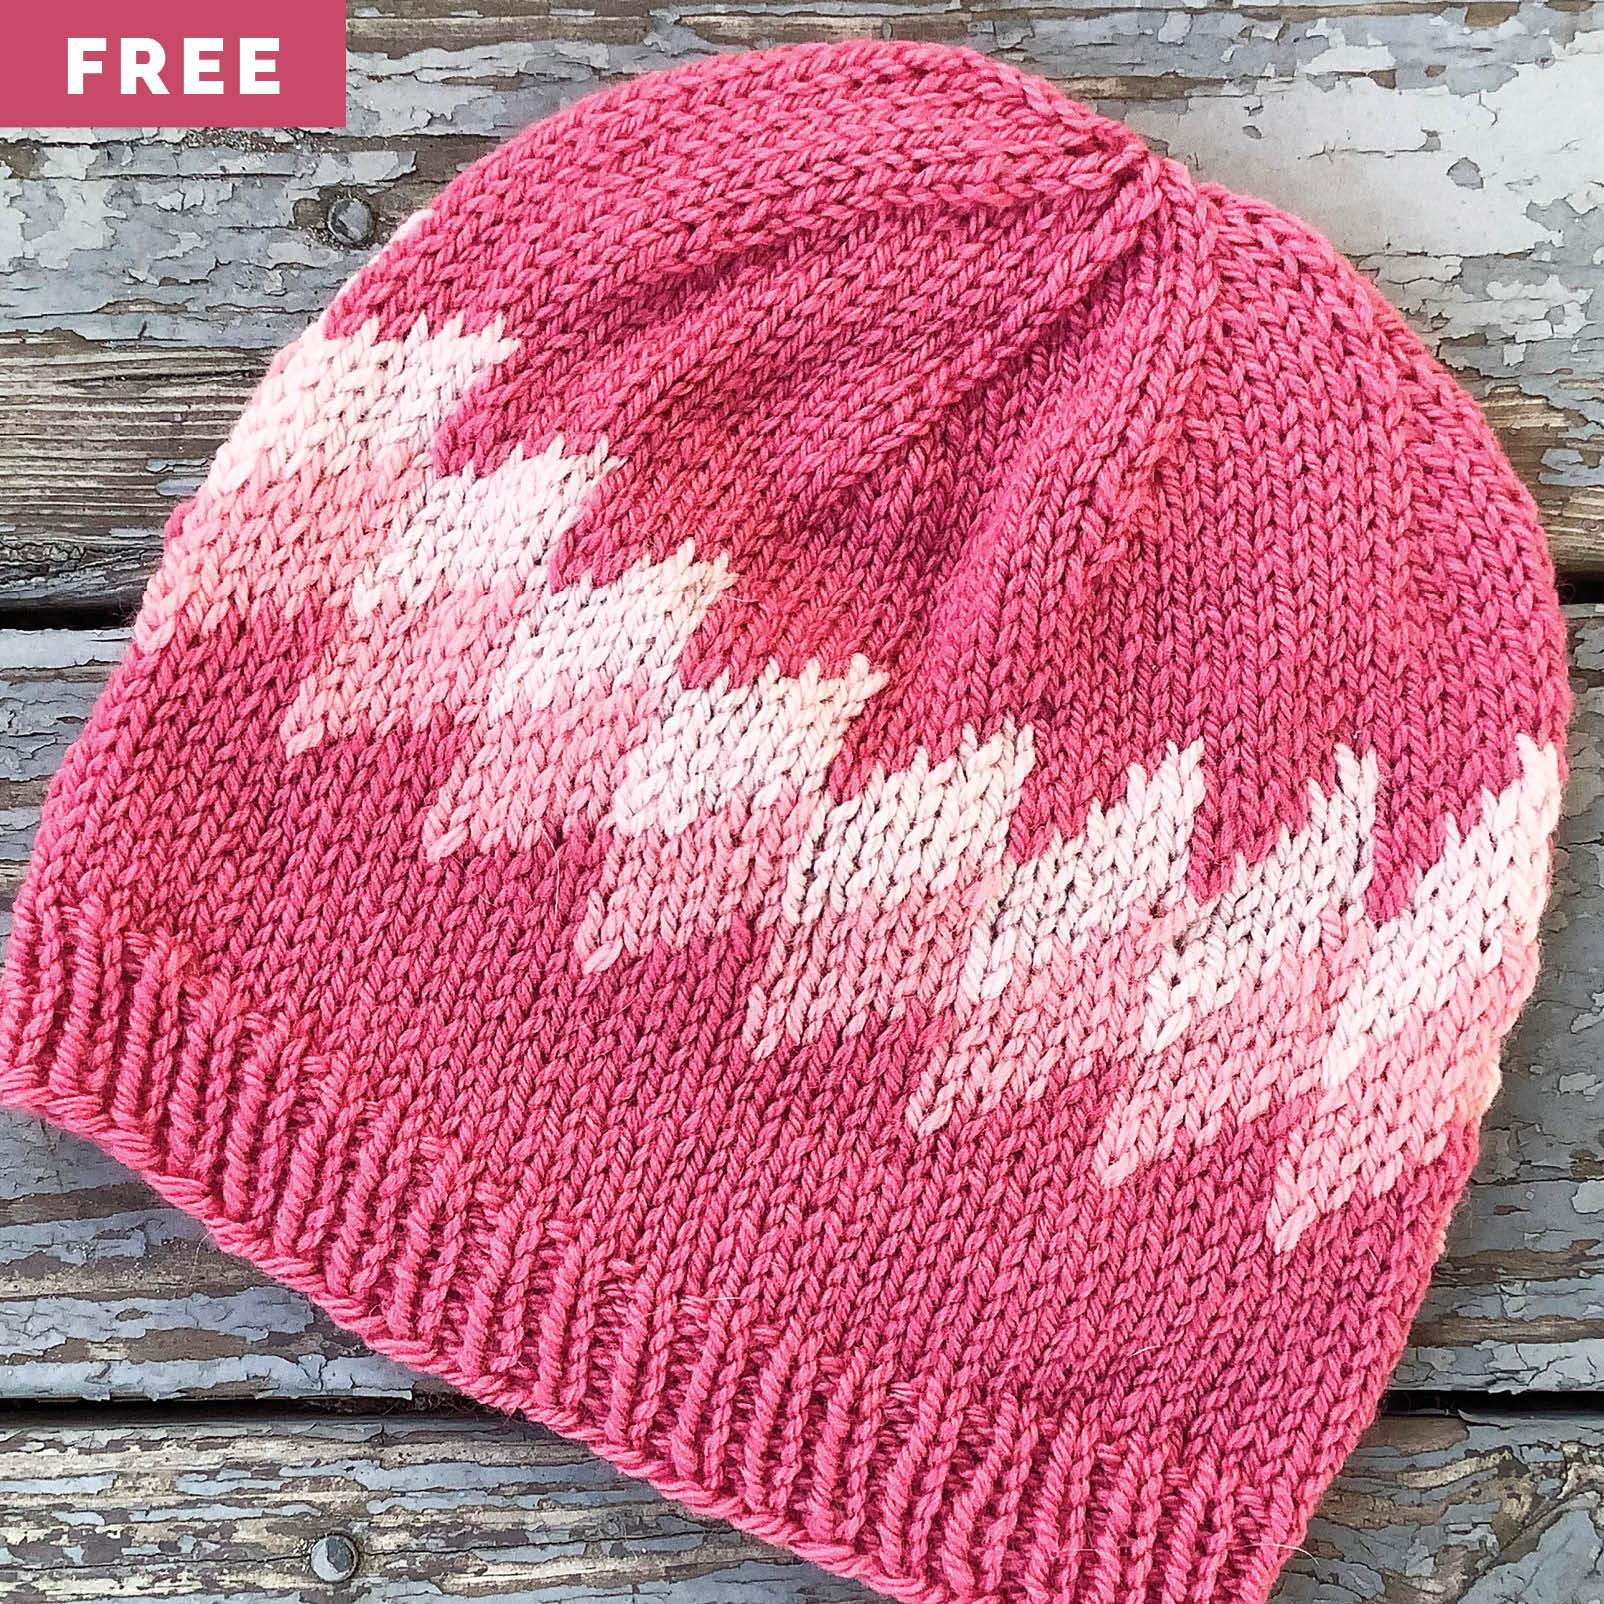 Free Knitting Pattern - Stranded Diamonds Hat